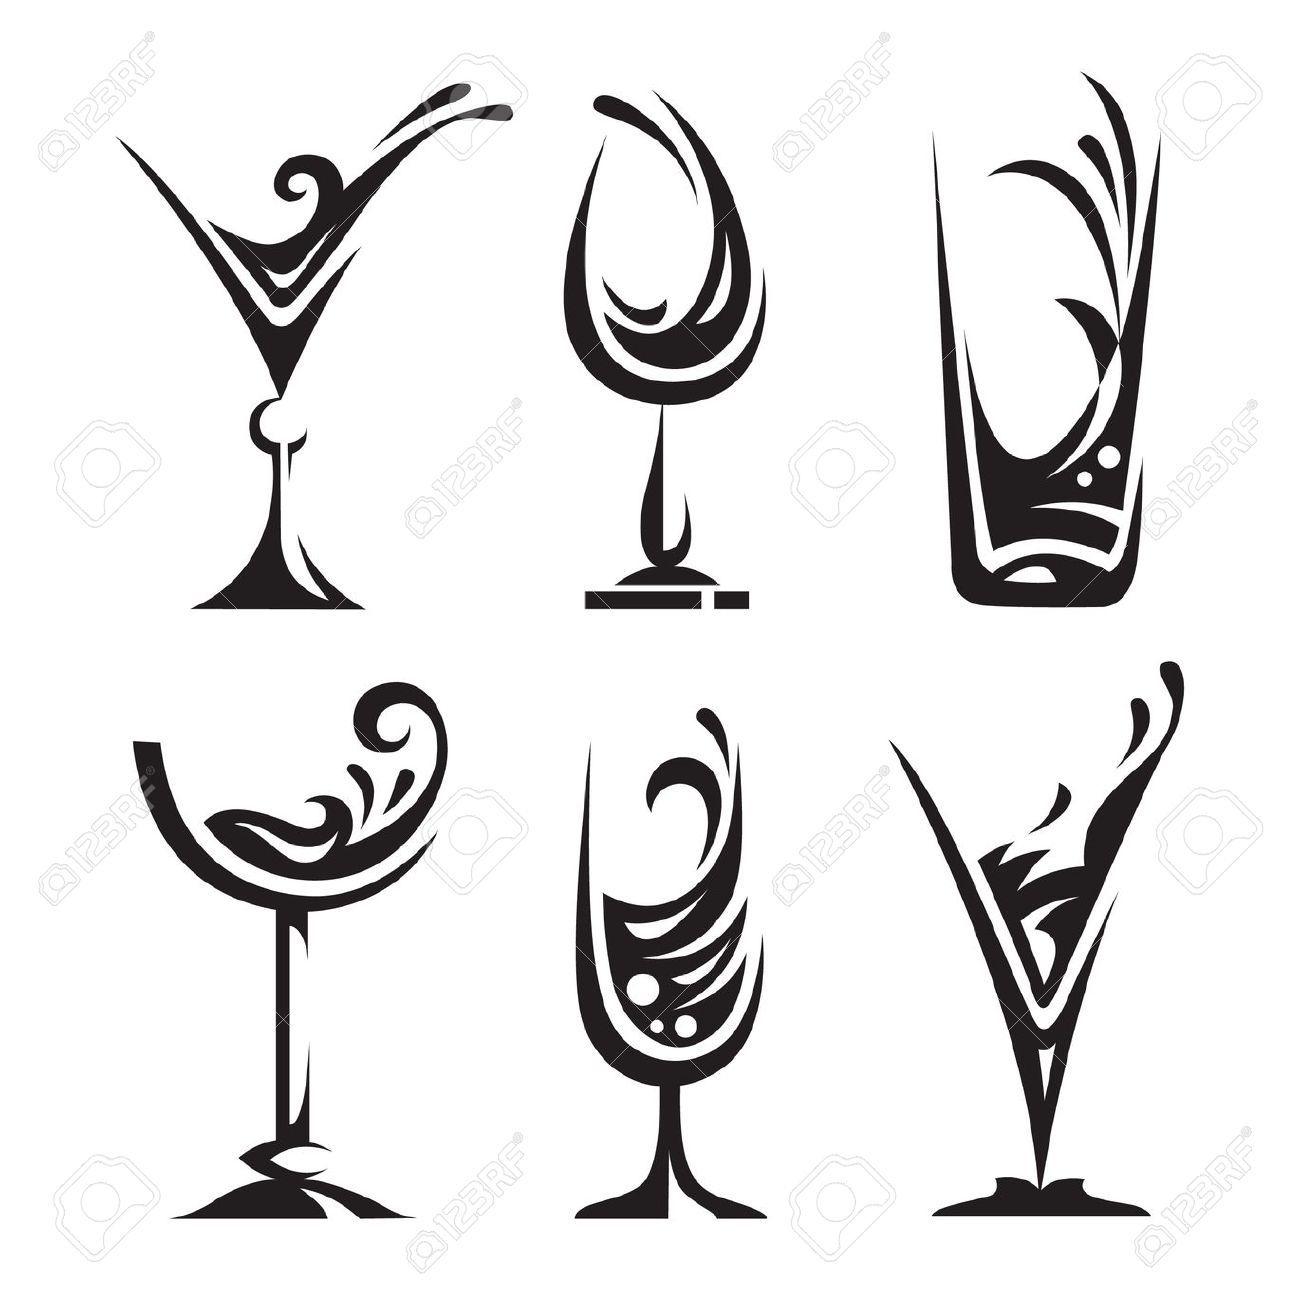 Clipart Ustensiles De Cuisine Meilleur De Photos Drinking Glass Collection Royalty Free Cliparts Vectors and